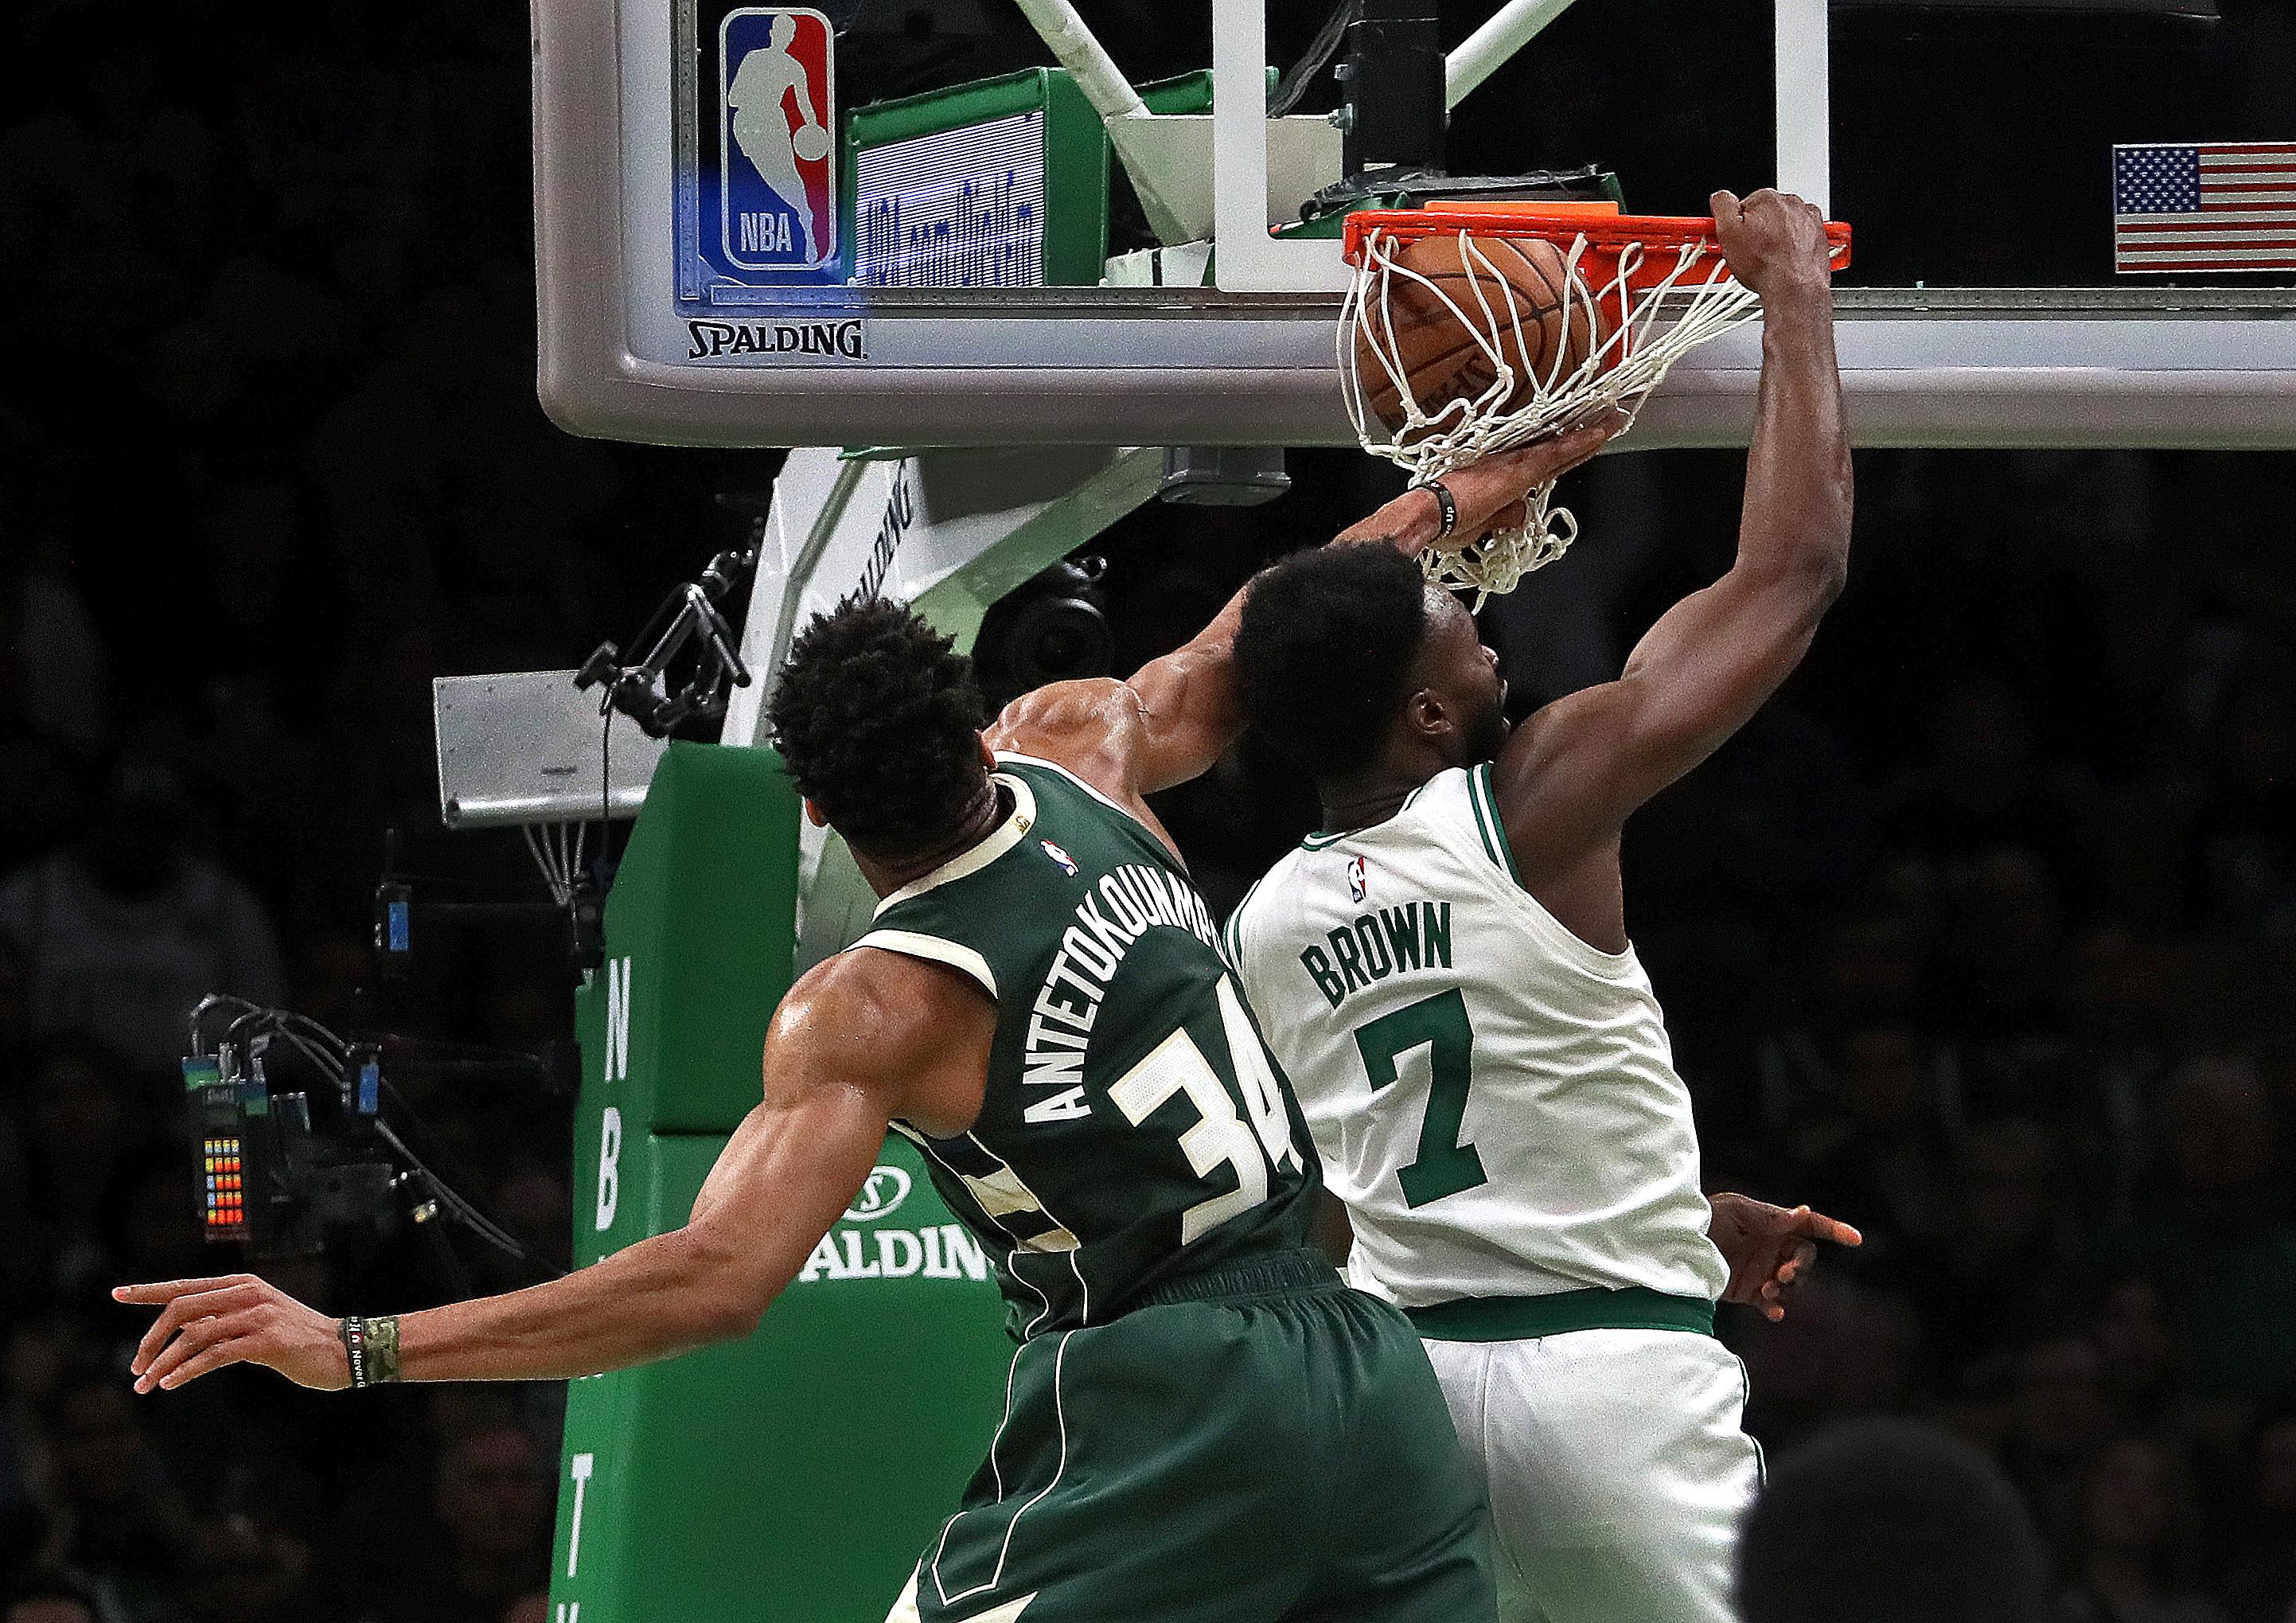 2019 NBA Playoffs: Milwaukee Bucks Vs Boston Celtics At TD Garden